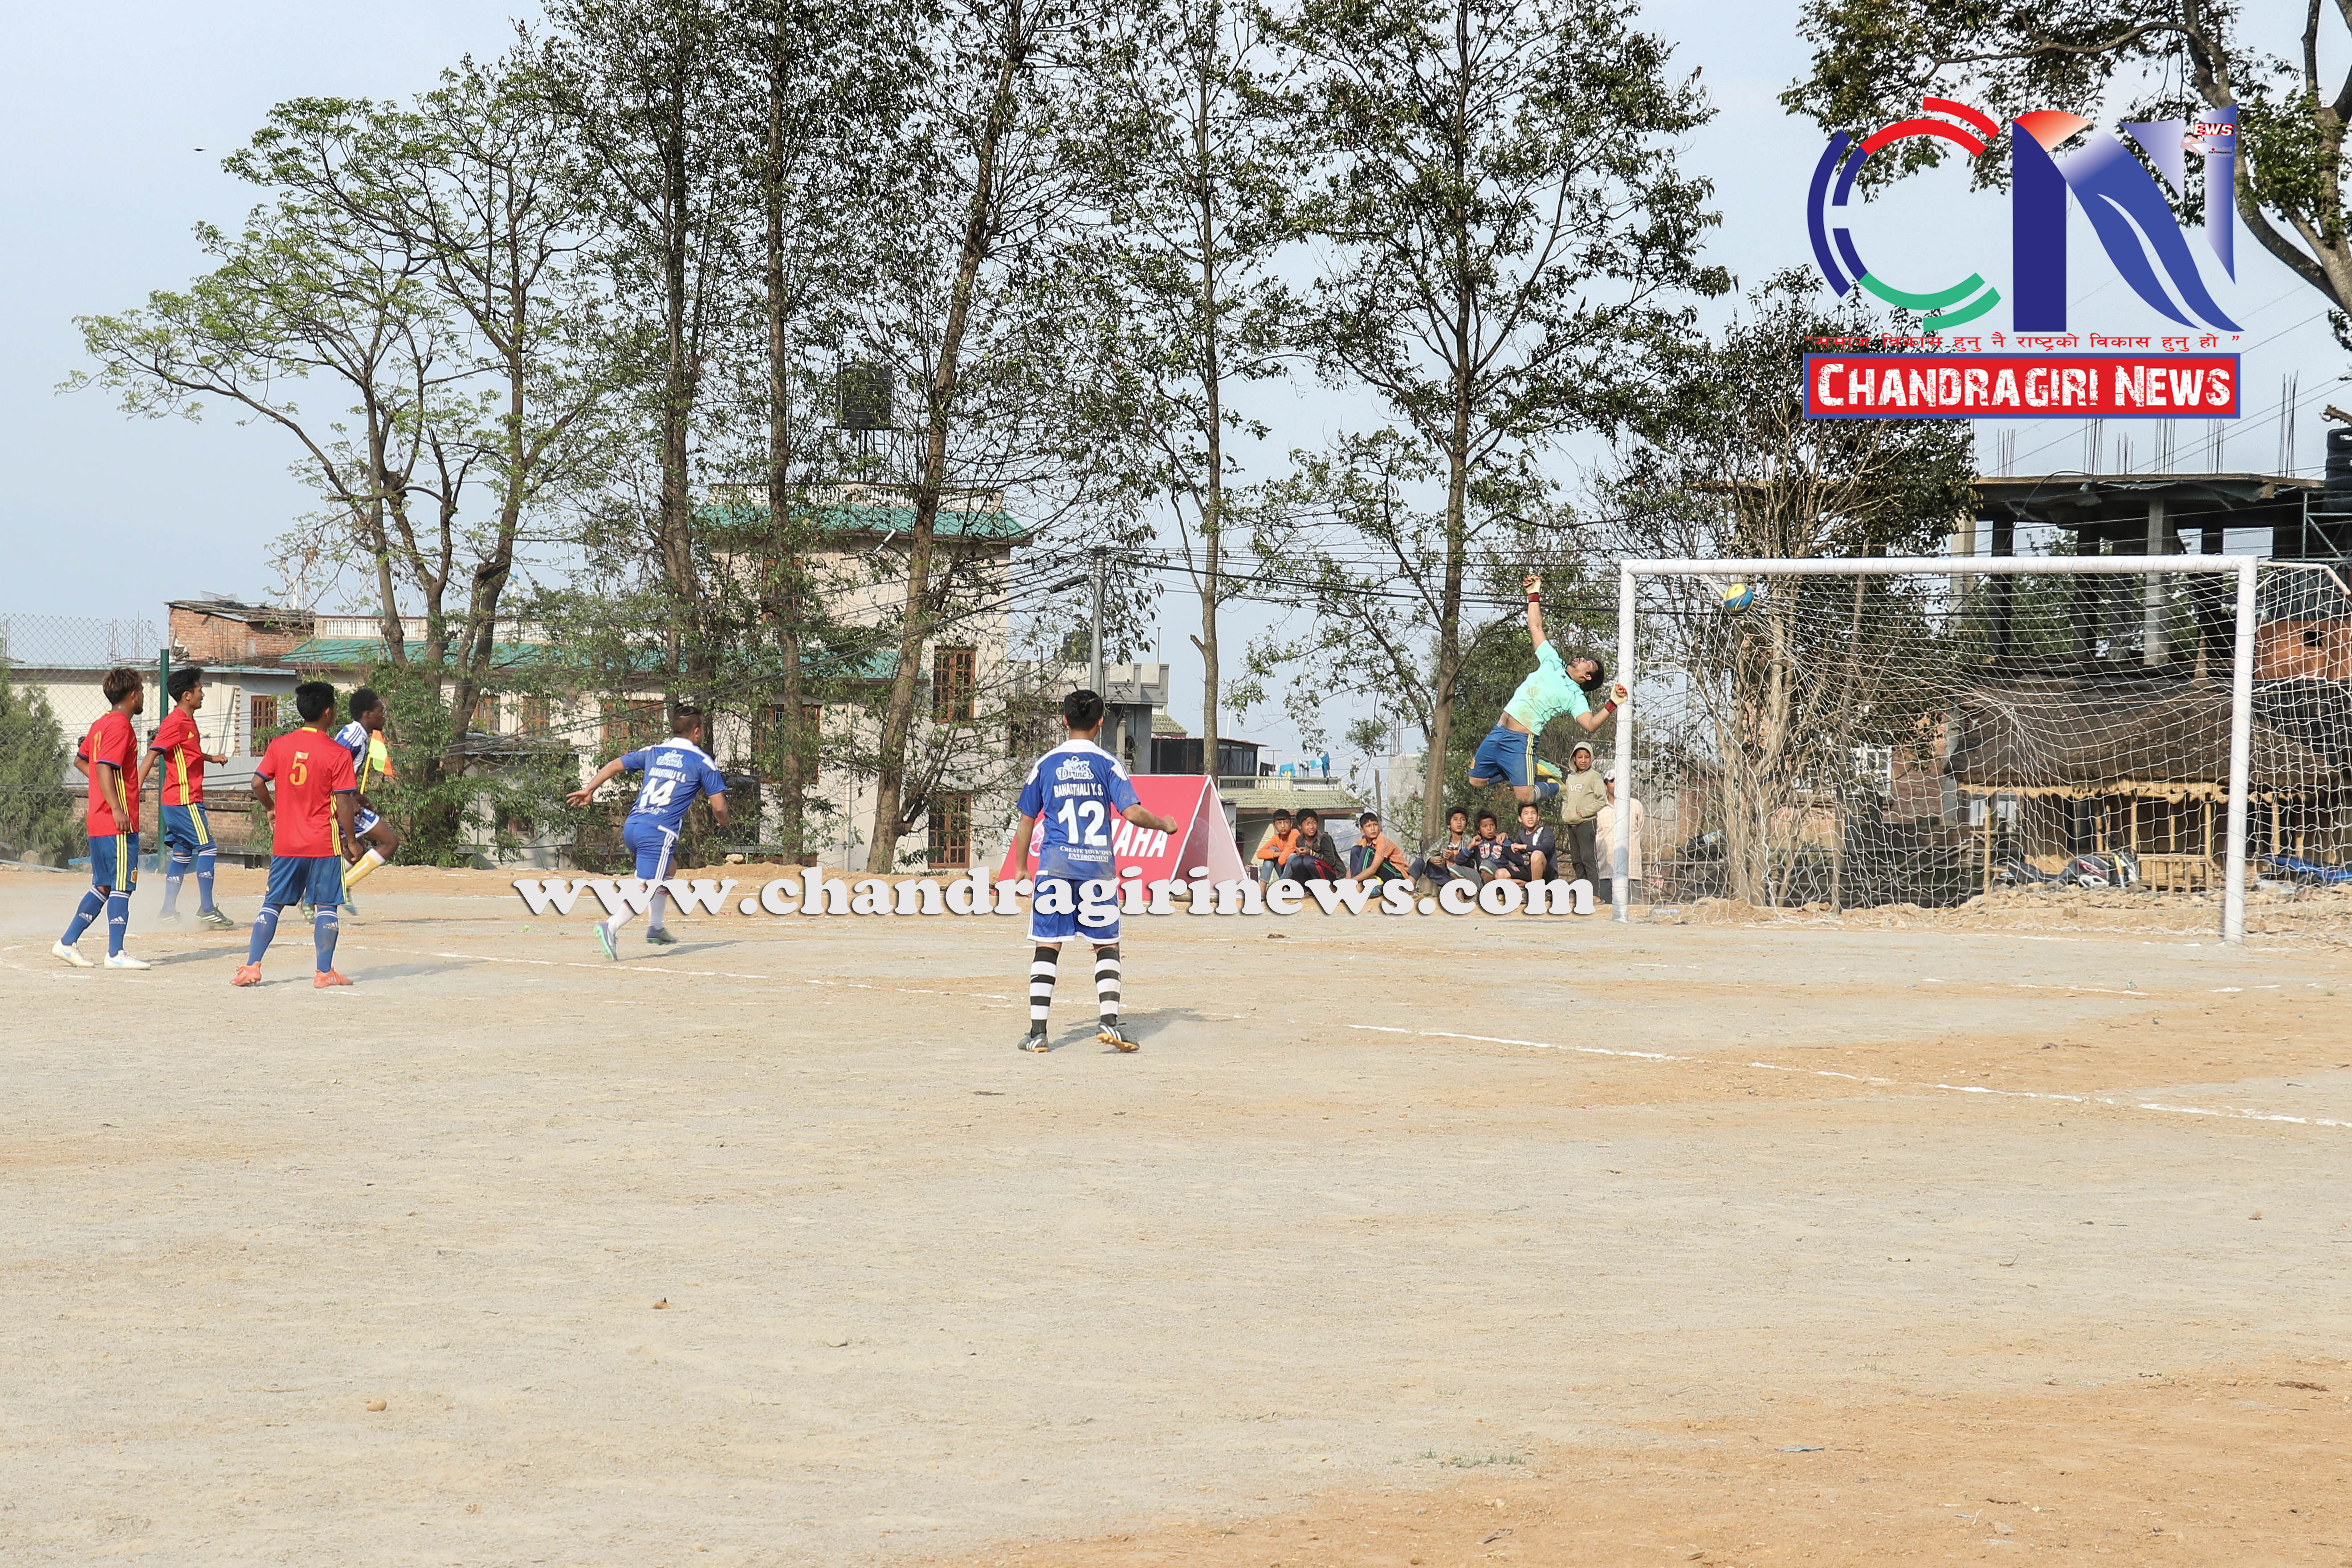 Chandragirinews first-game-wuc-16 चाैठाै  नेपाललय वईस्टन युनाईटेड क्लव फुटबल प्रतियाेगिता सुरू काठमाडौं किसीपिँडी खेलकुद थानकोट ब्रेकिंग न्युज महादेव स्थान मातातिर्थ मुख्य    chandragiri